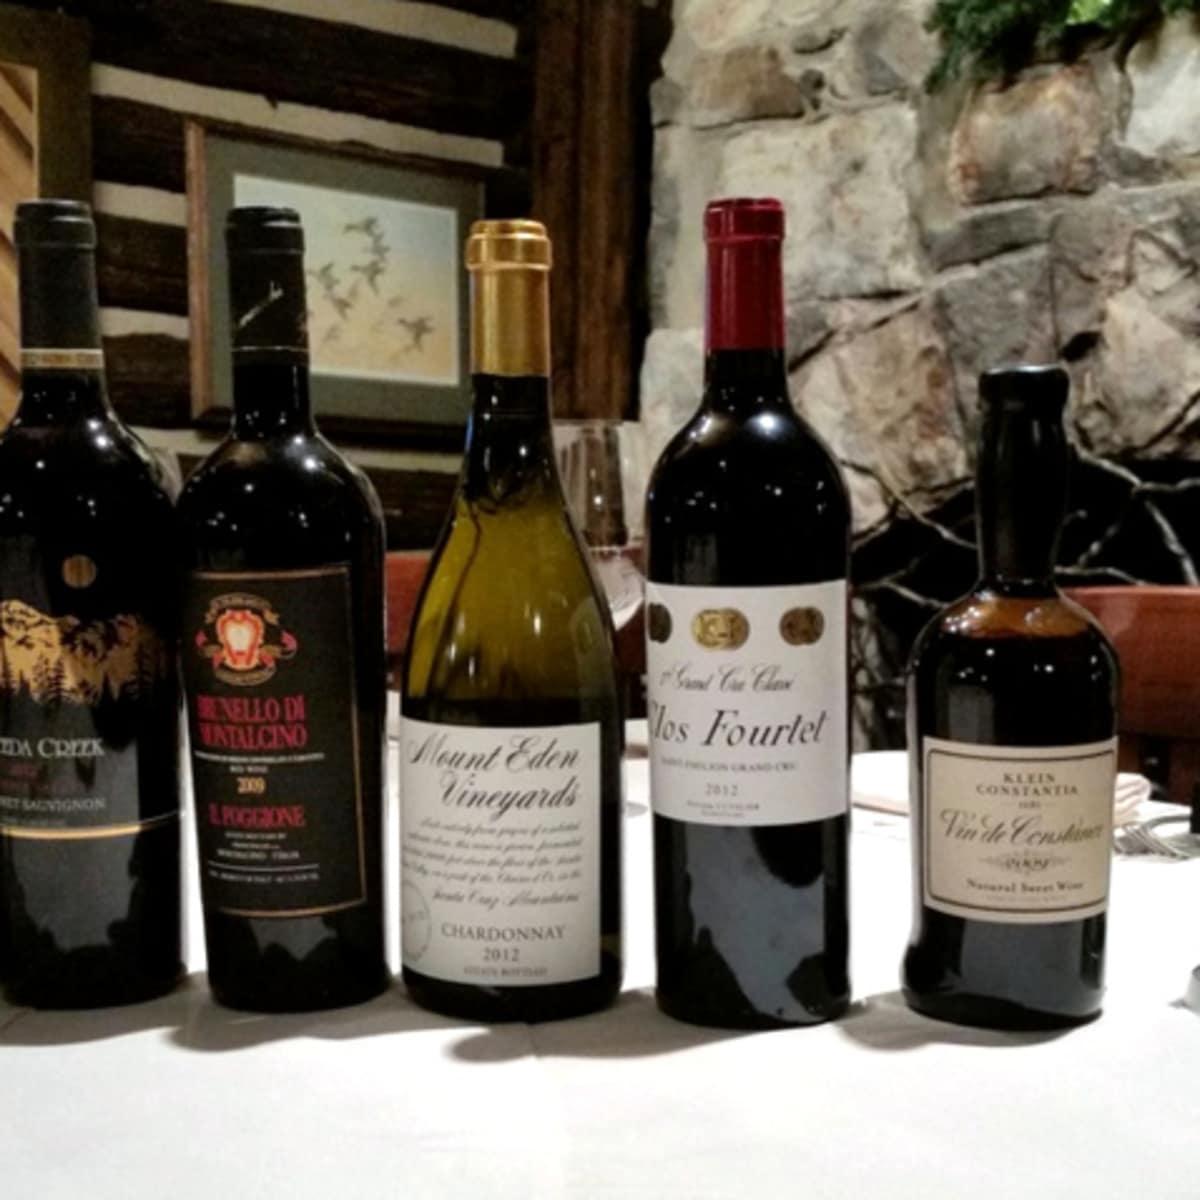 Rainbow Lodge Coravin wine spectator